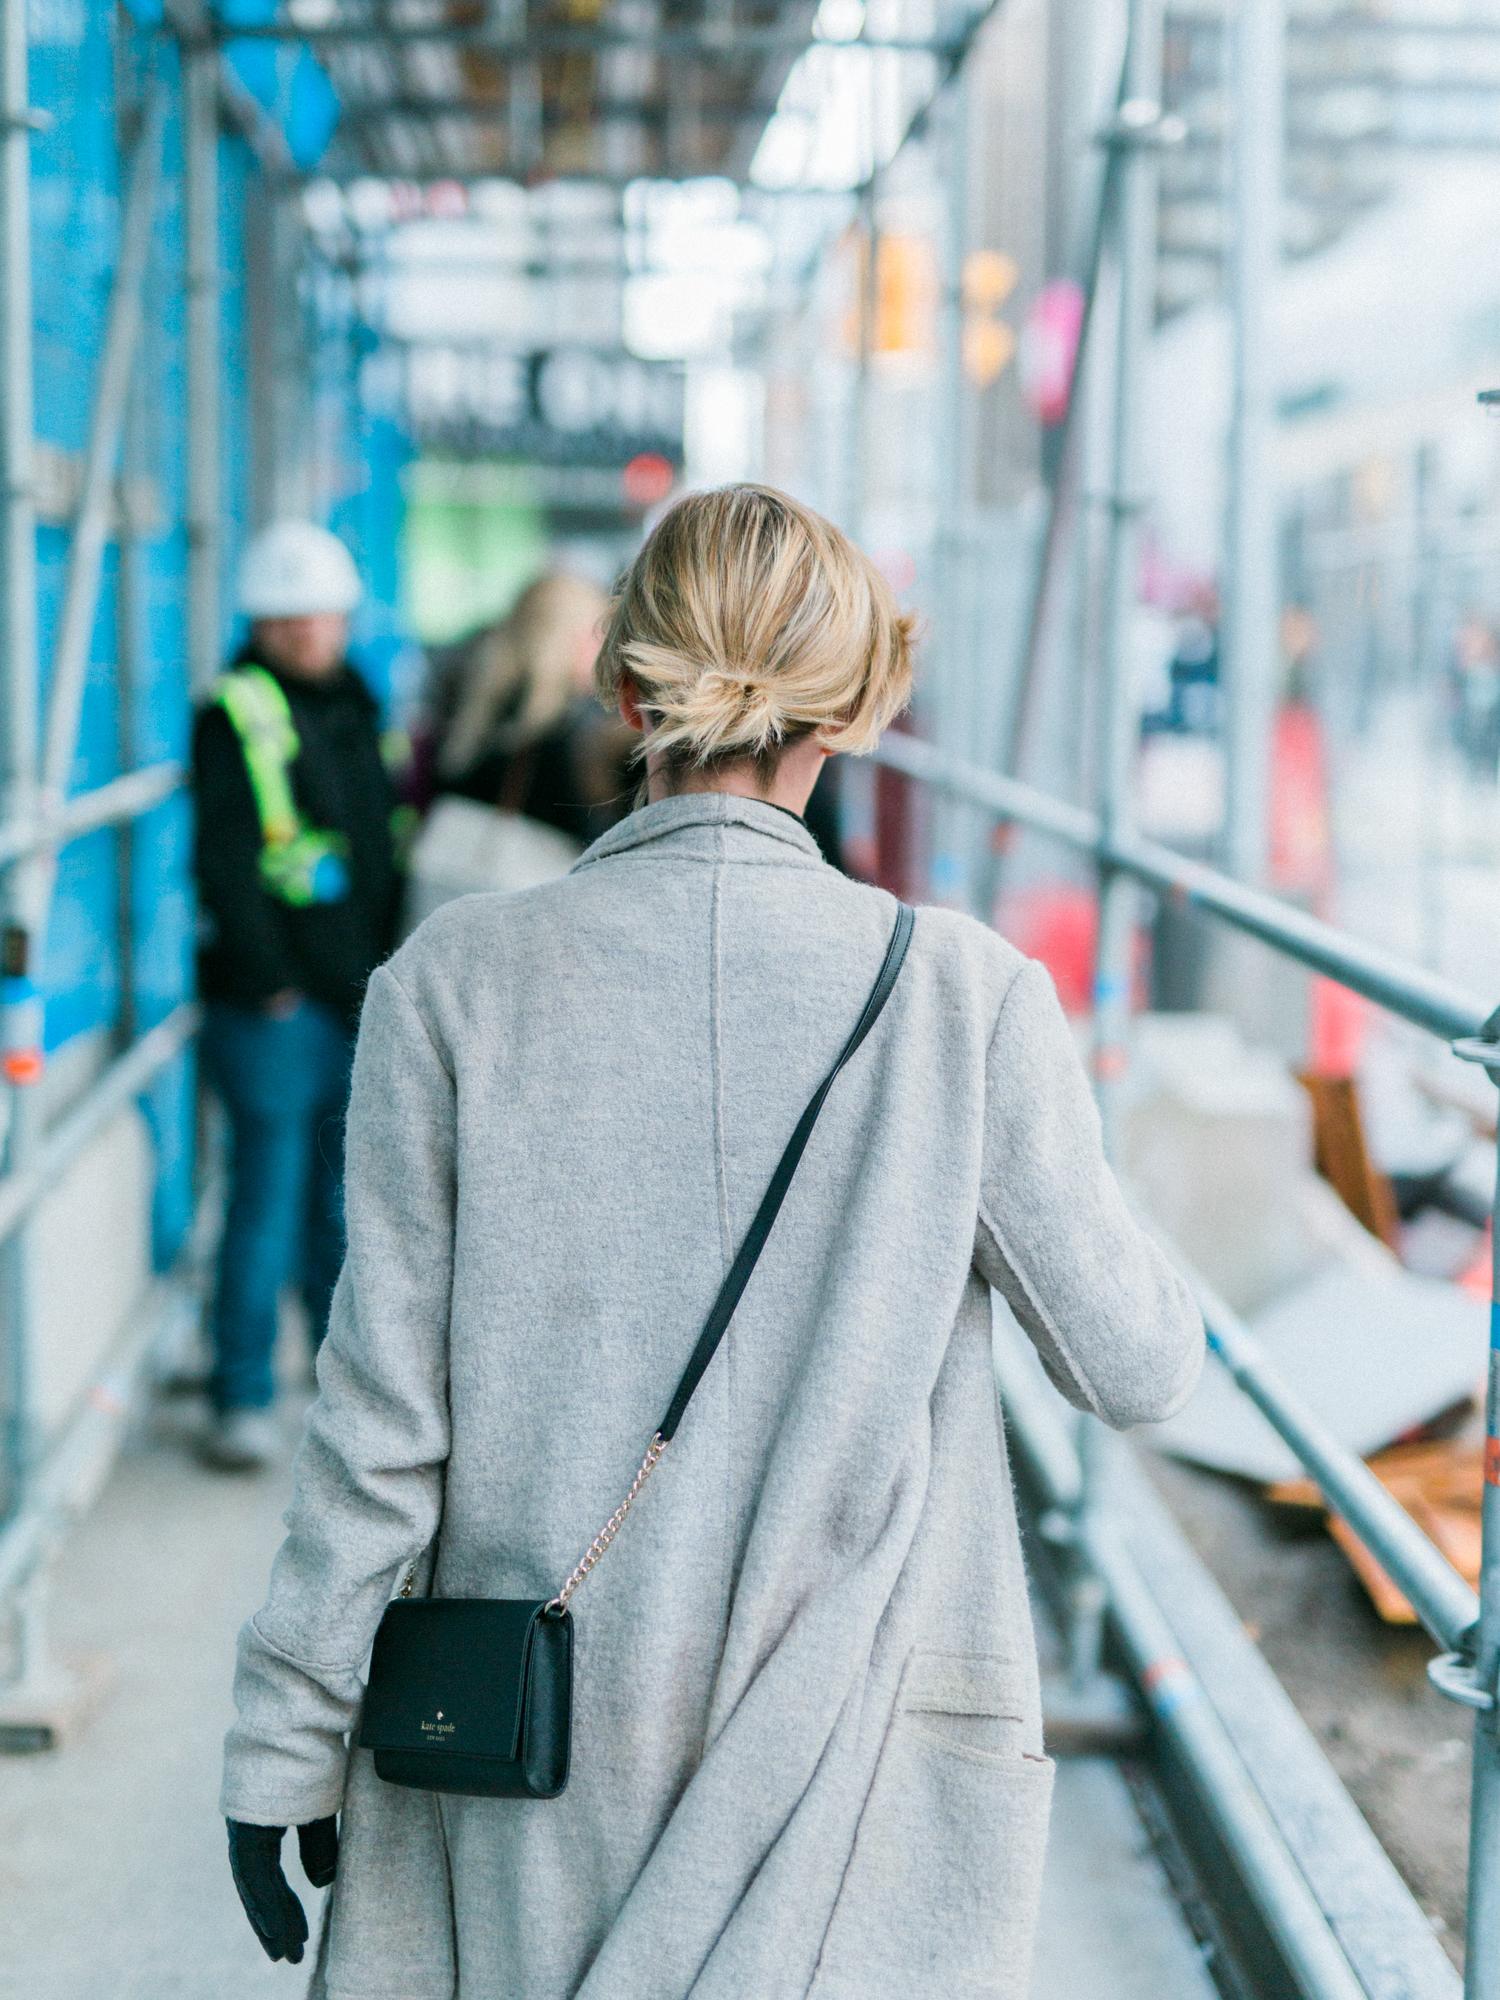 DanielleGirouxPhotography_Toronto_Portrait_StreetPhotography_0C6A1087.jpg